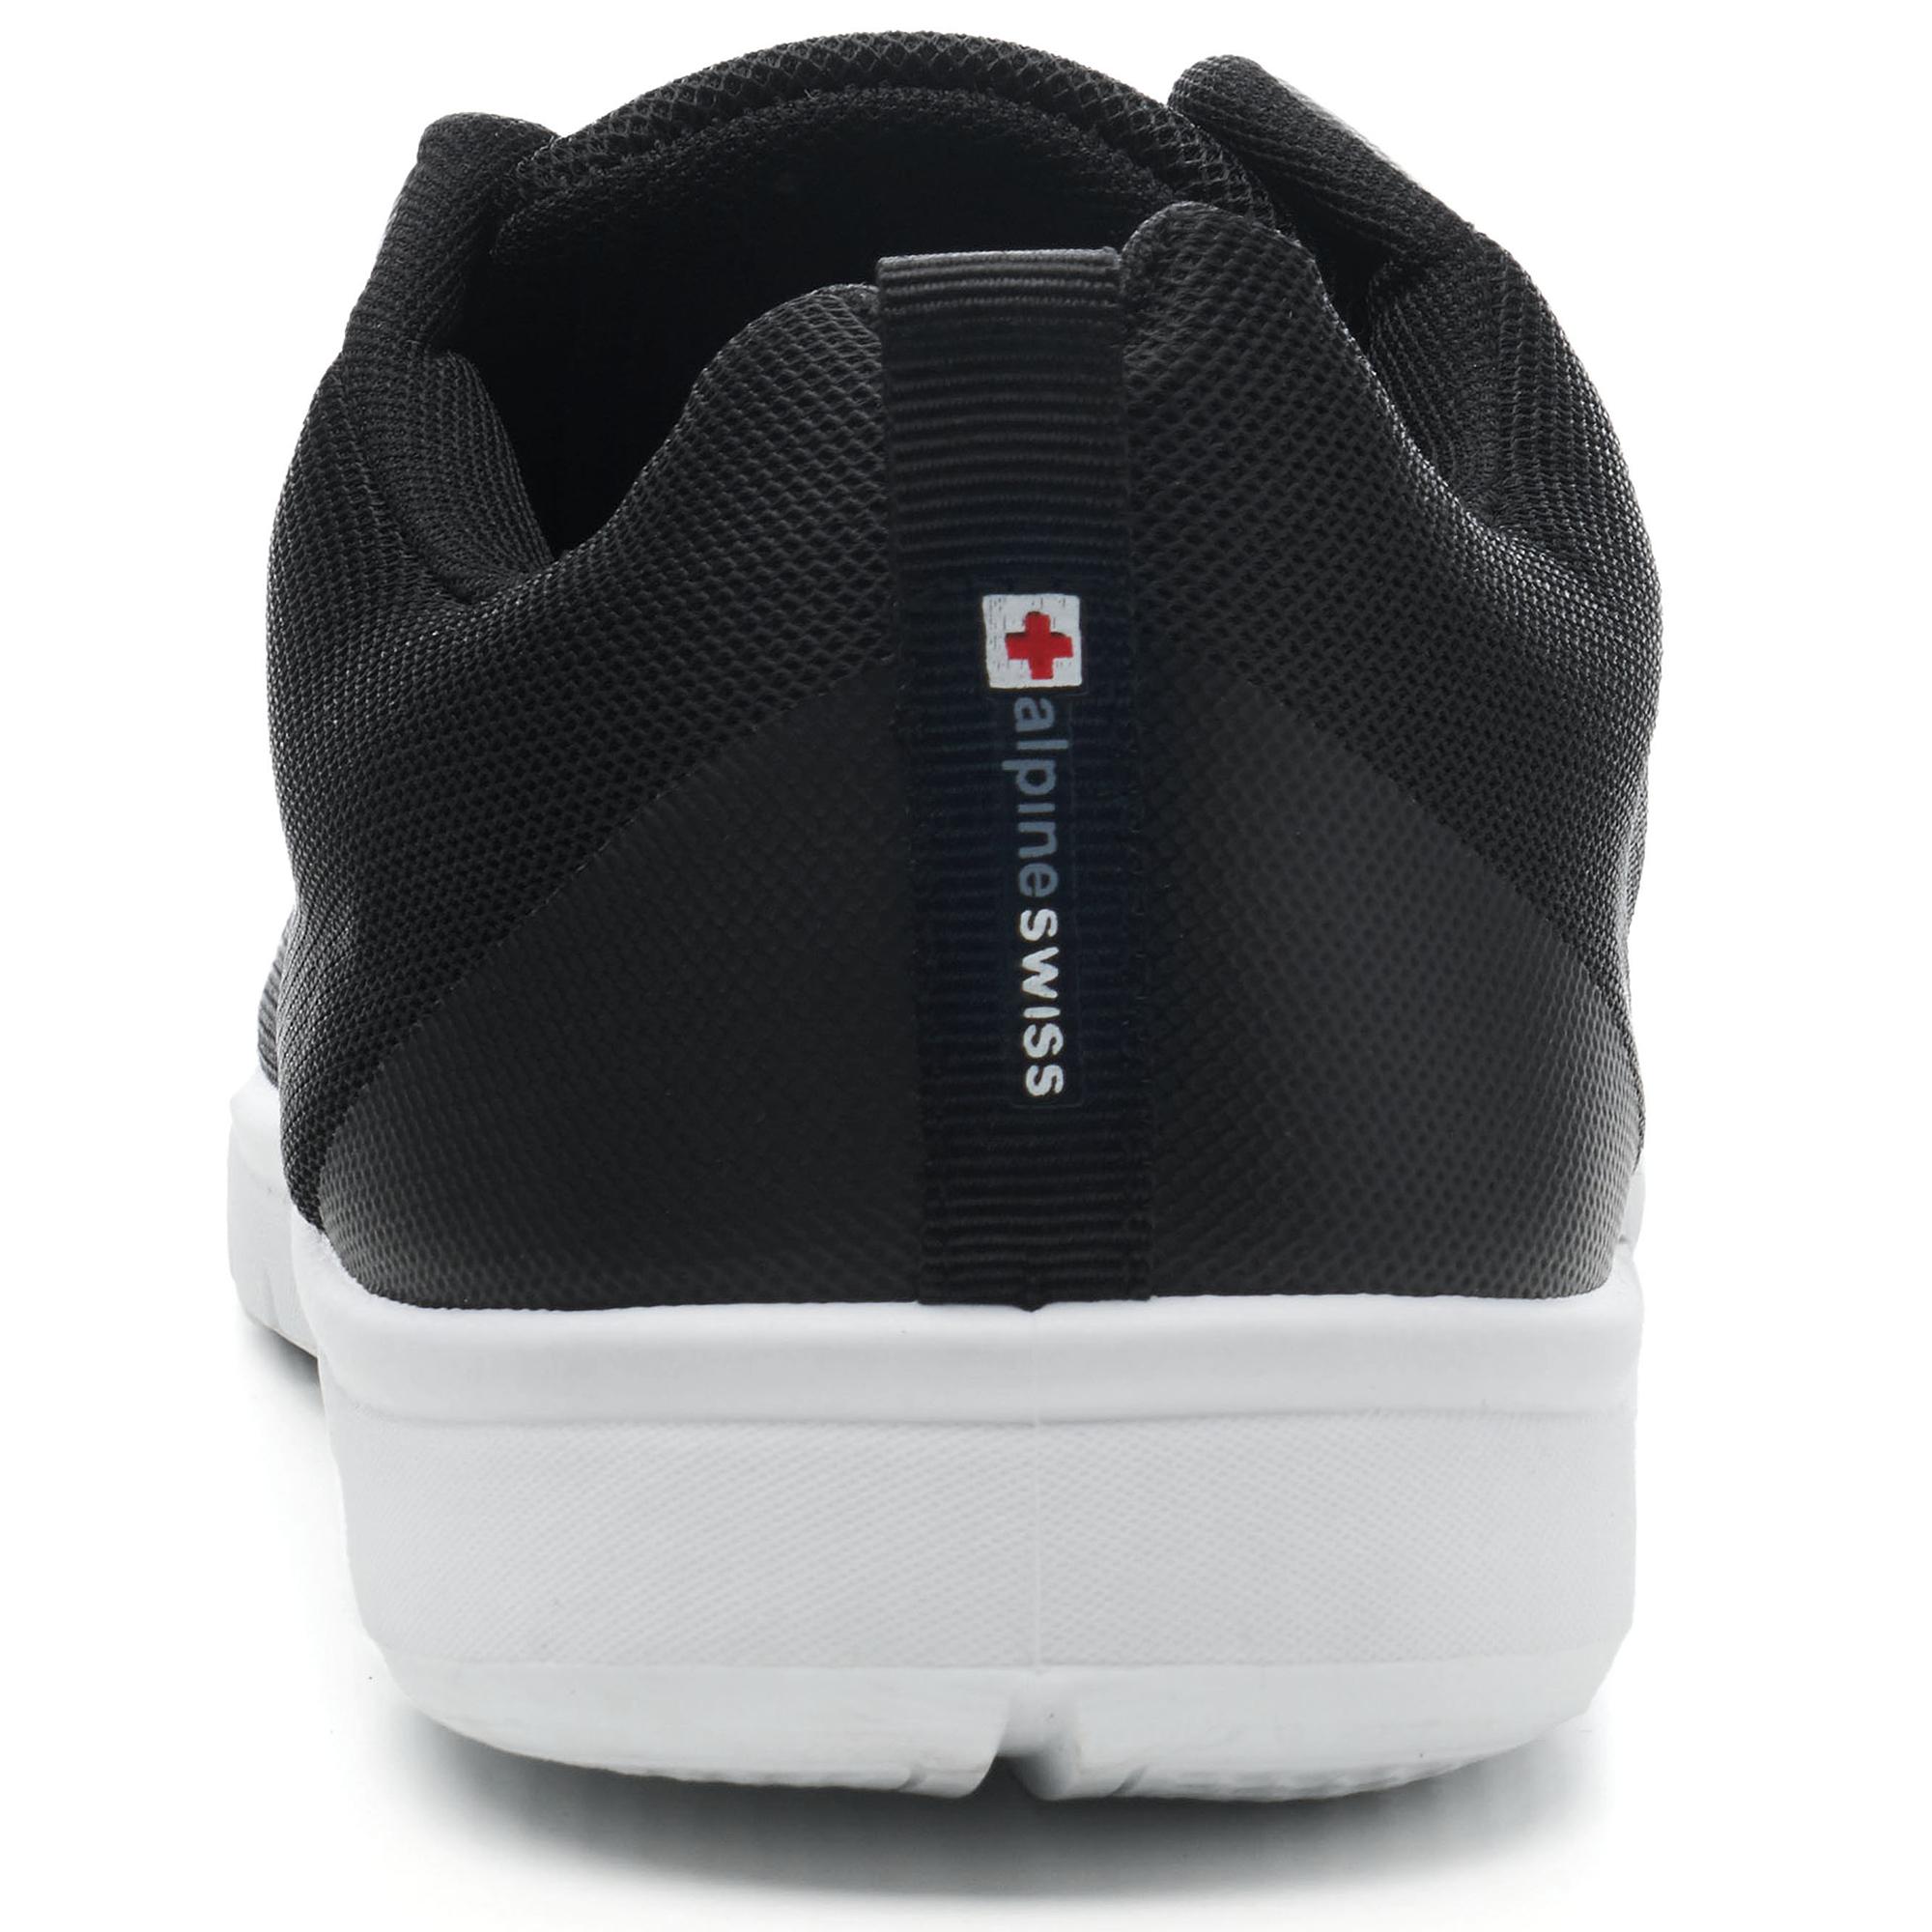 thumbnail 14 - Alpine Swiss Bolt Mesh Sneaker Casual Light Shoes For Men With Shoe Bag